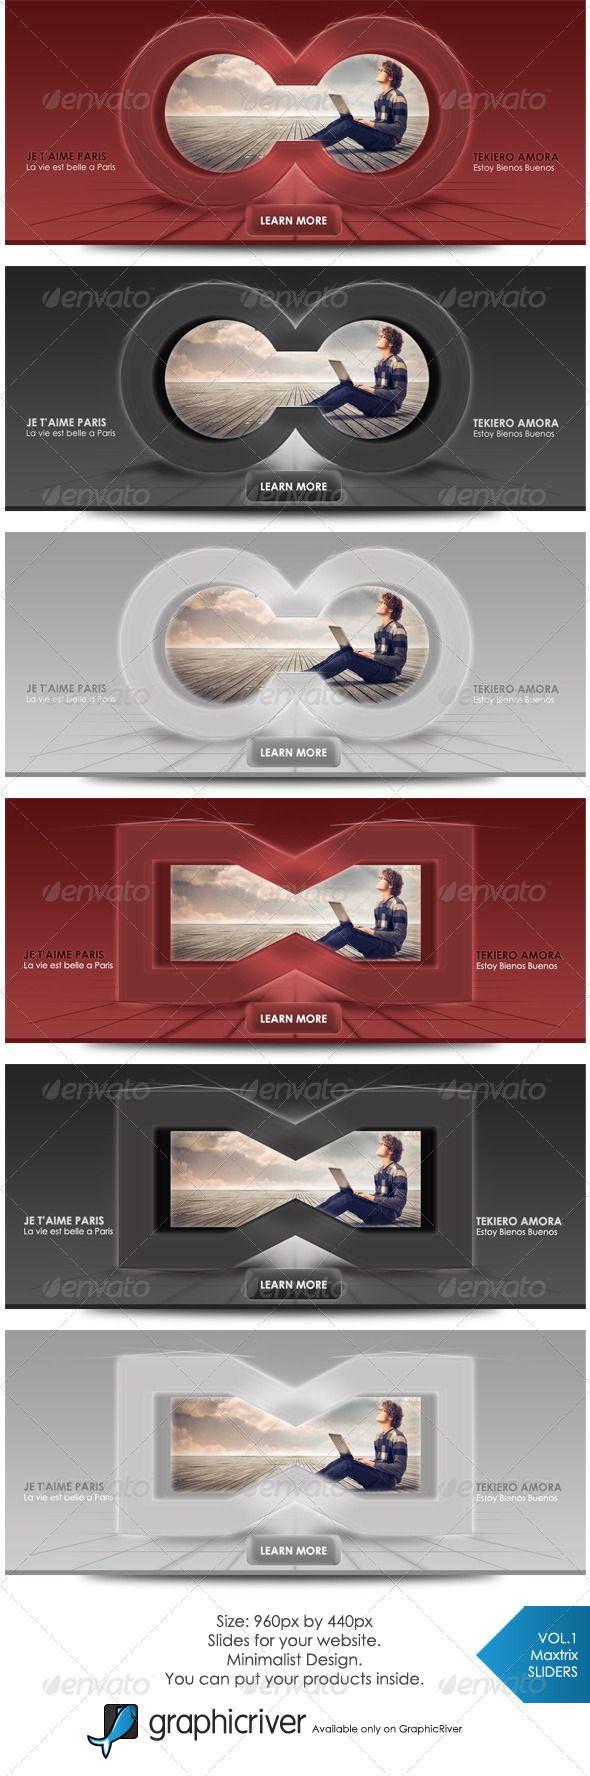 Design banner minimalist - Maxtrix Web Sliders Vol1 Web Banner Designweb